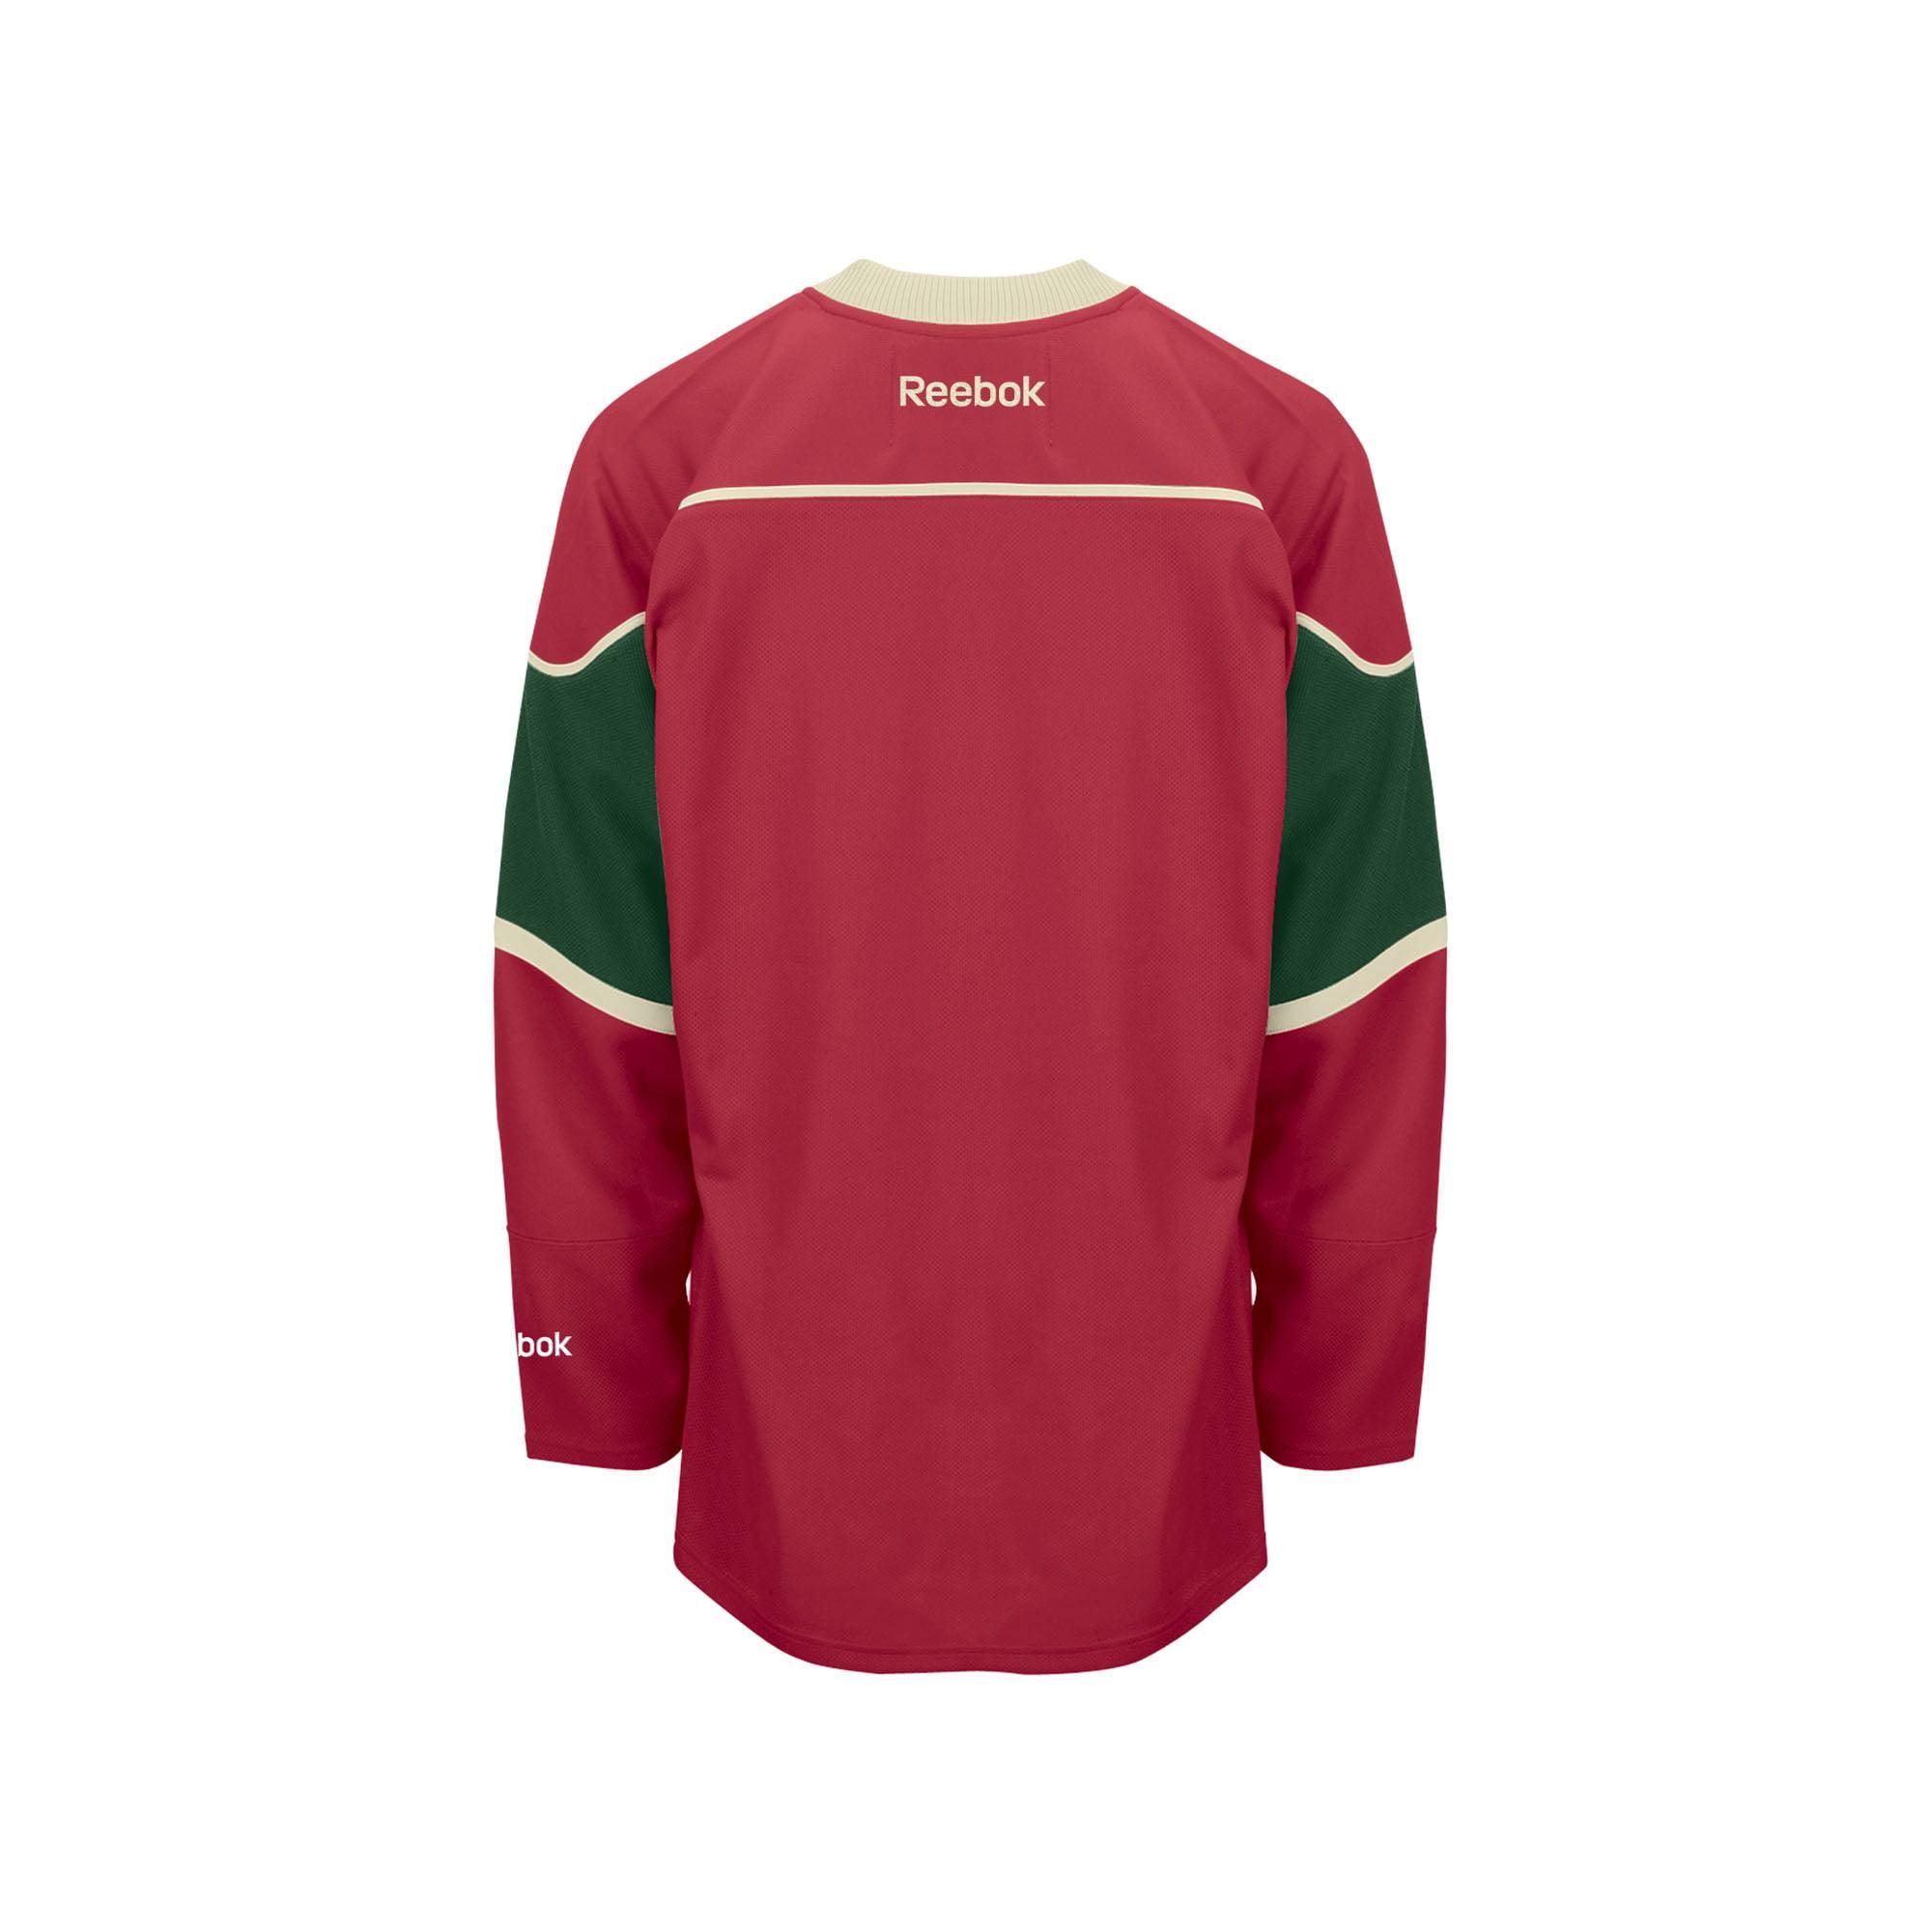 eaf8ea37 Reebok Minnesota Wild Youth Premier Home Jersey - Green - L/XL ...